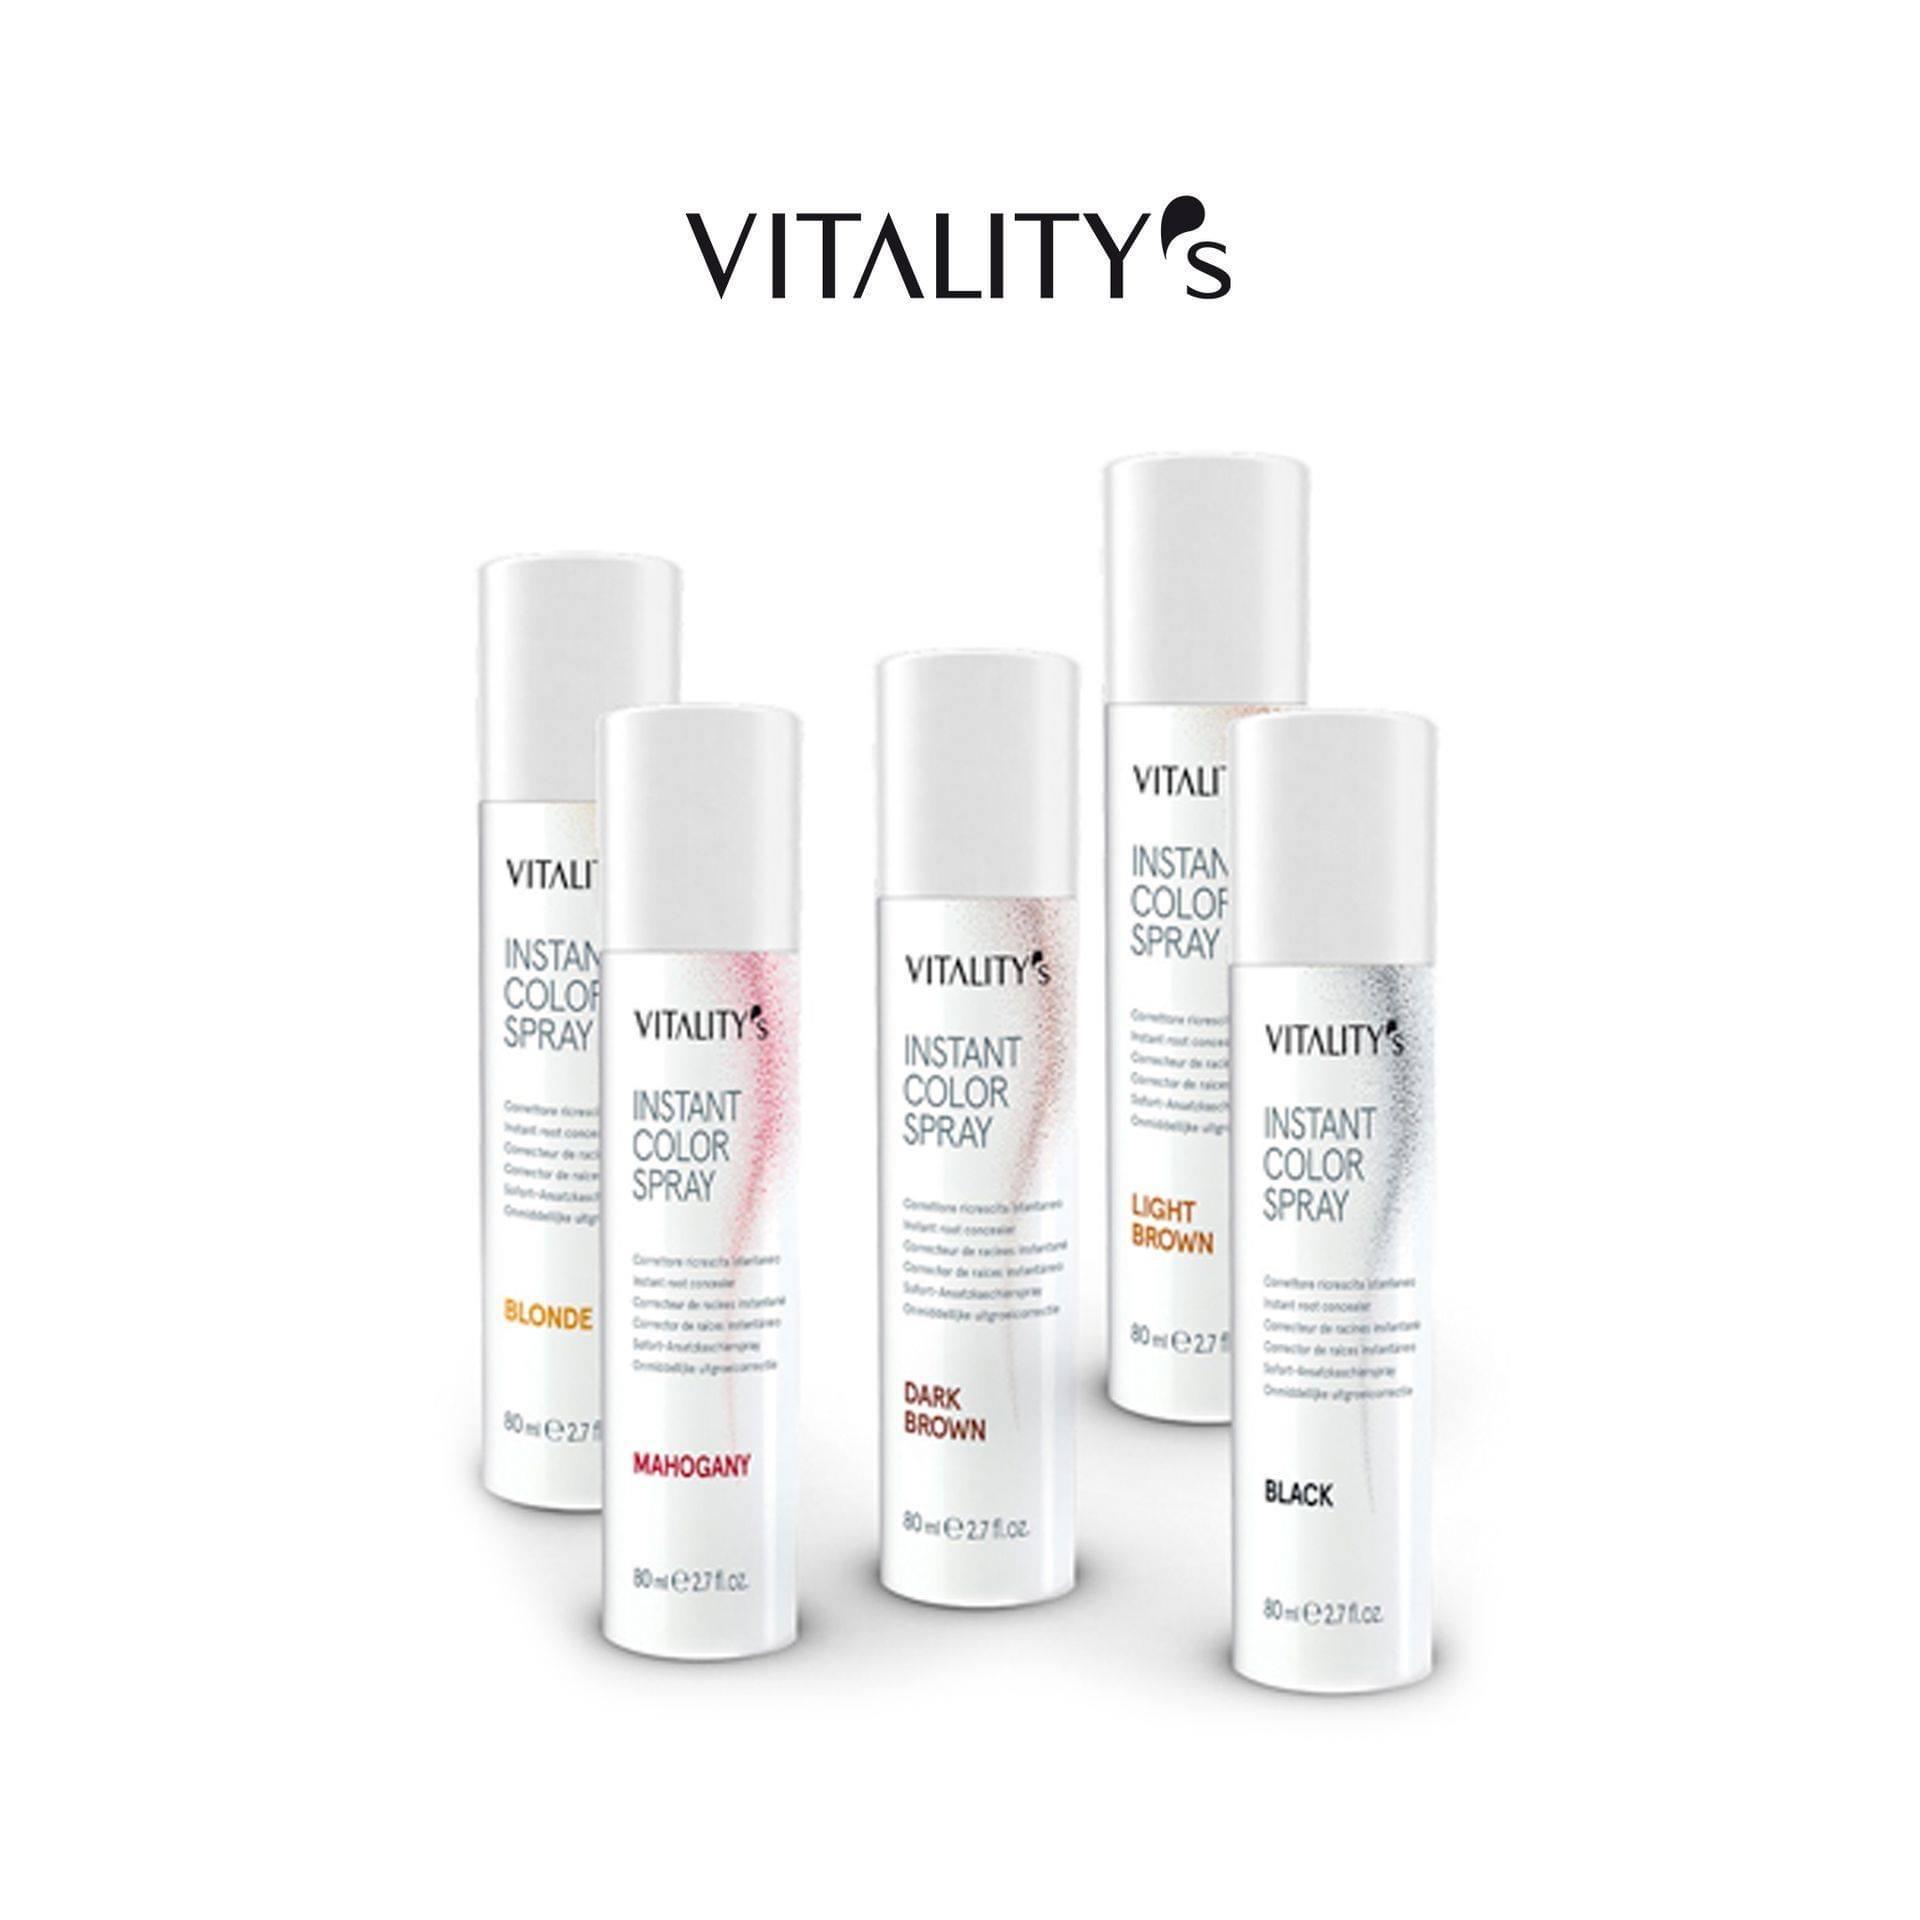 vitality's instant color spray